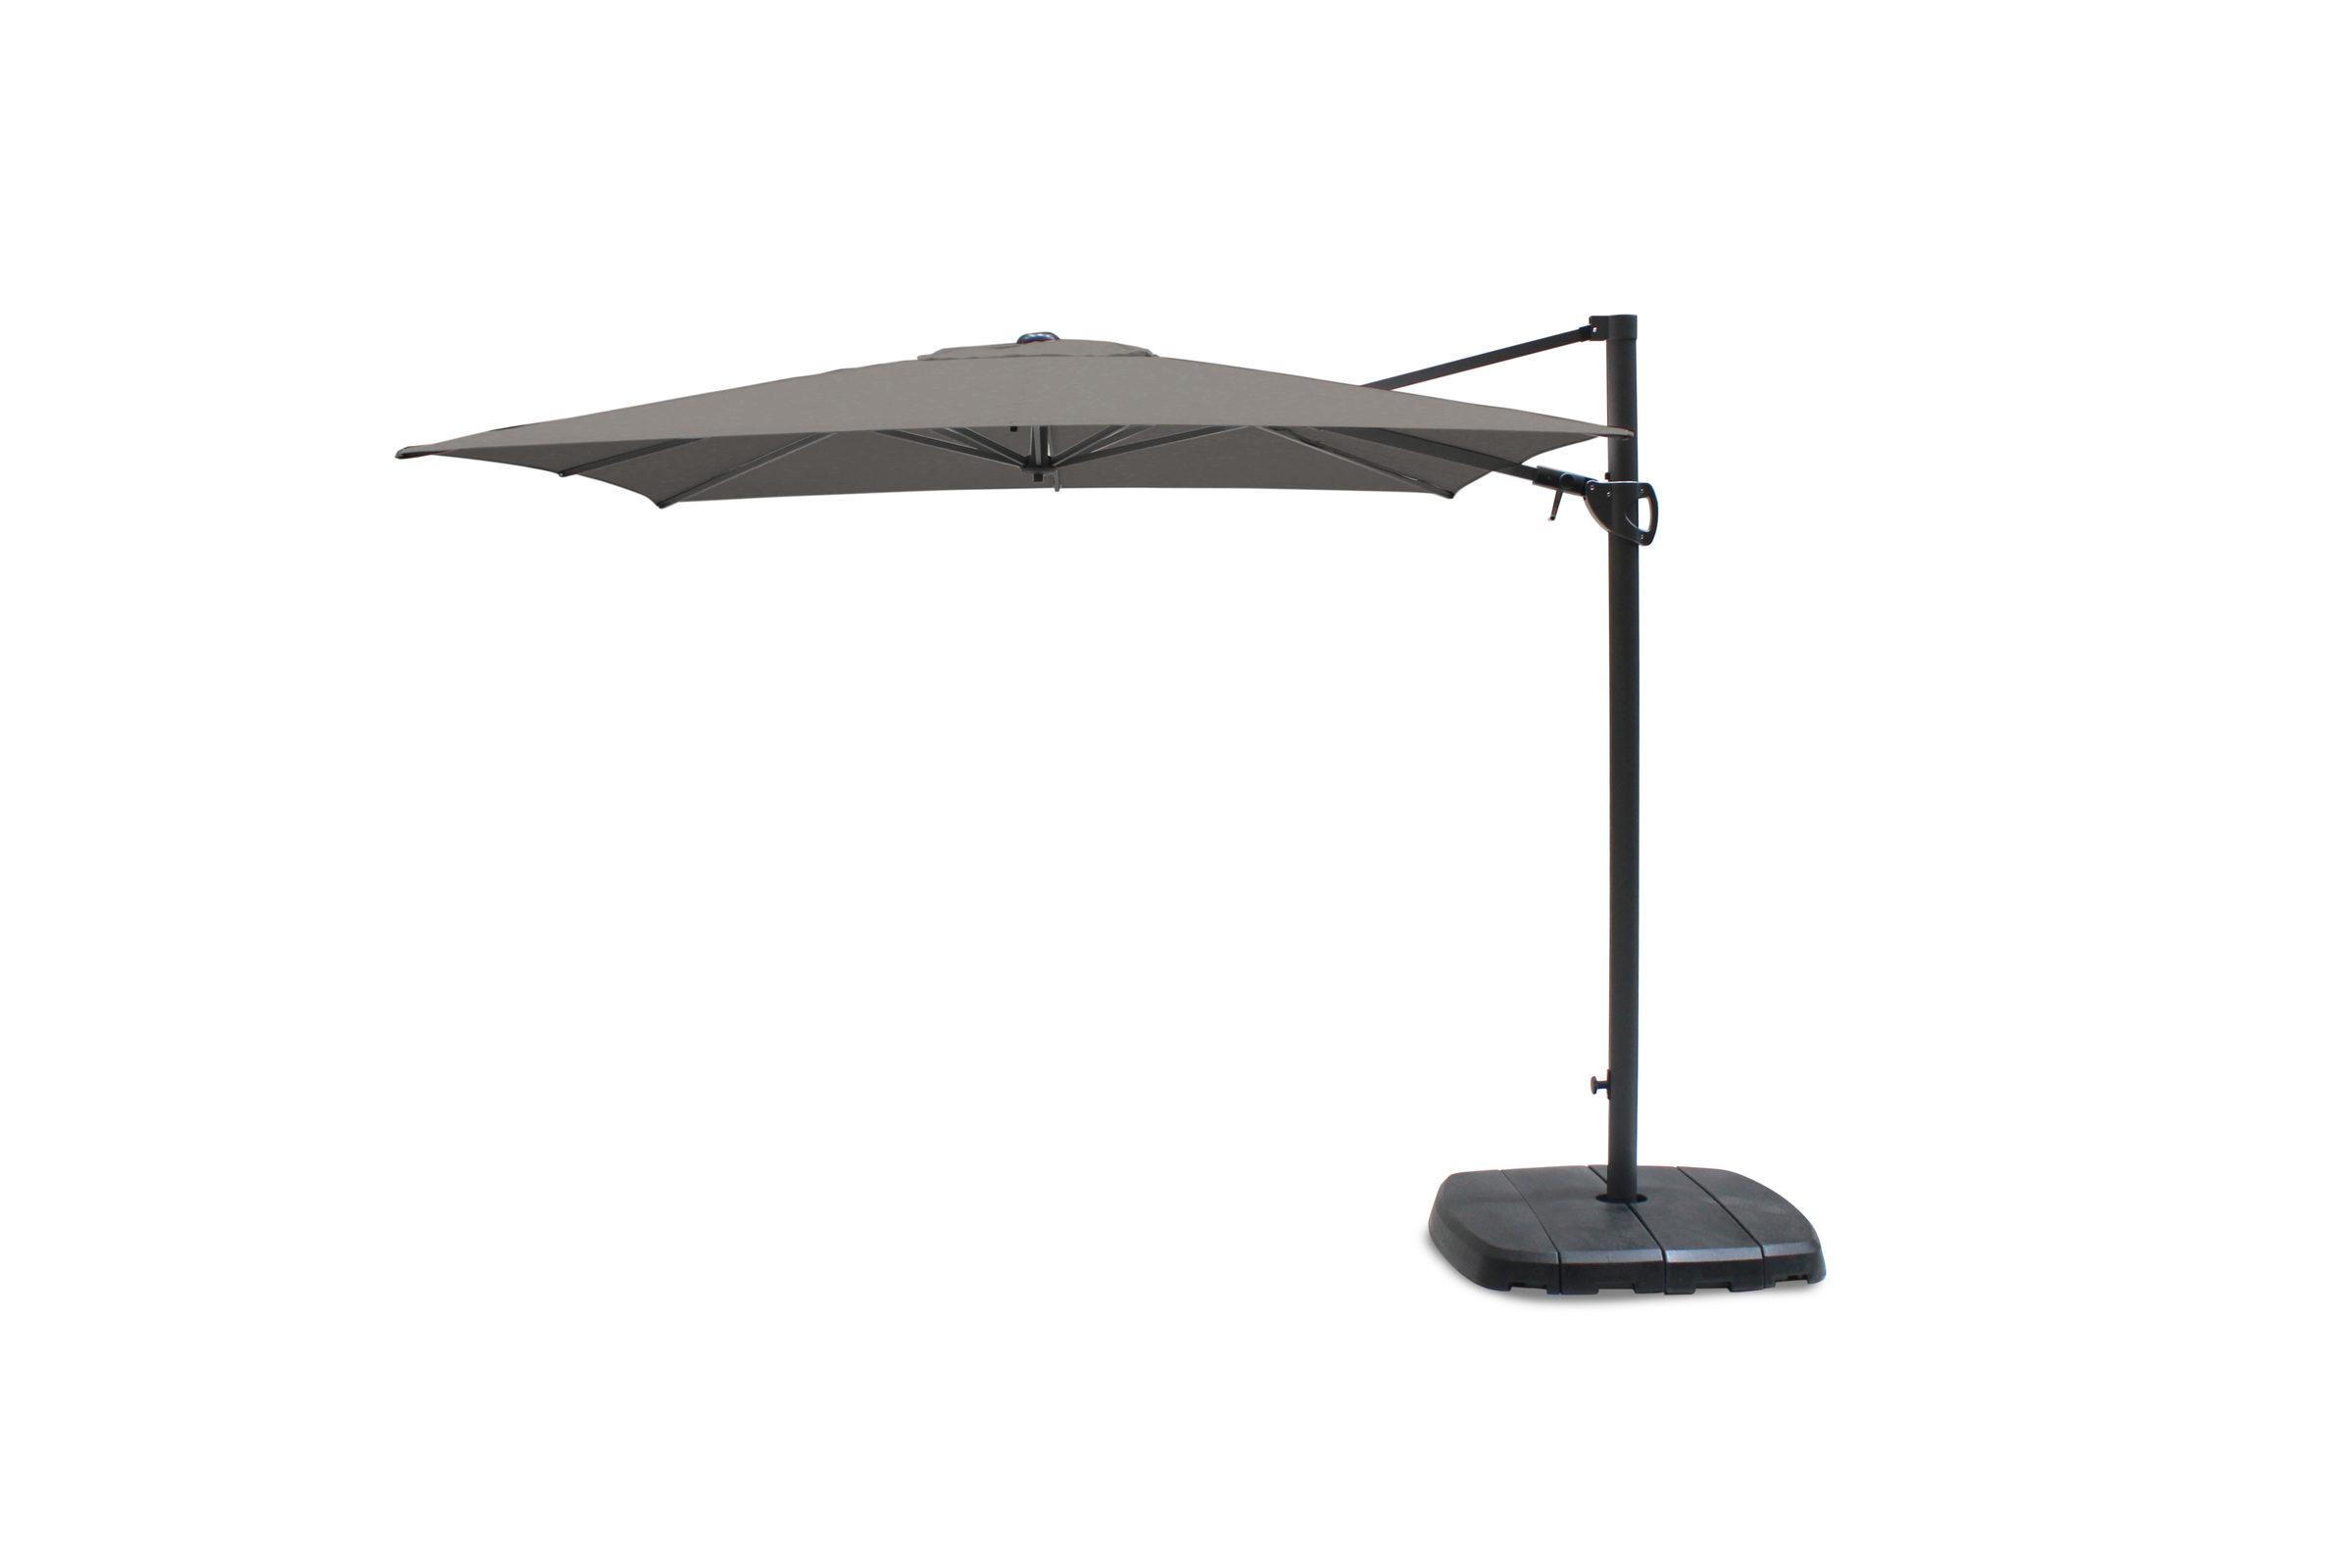 Kettler 2.5m Square Free Arm Parasol